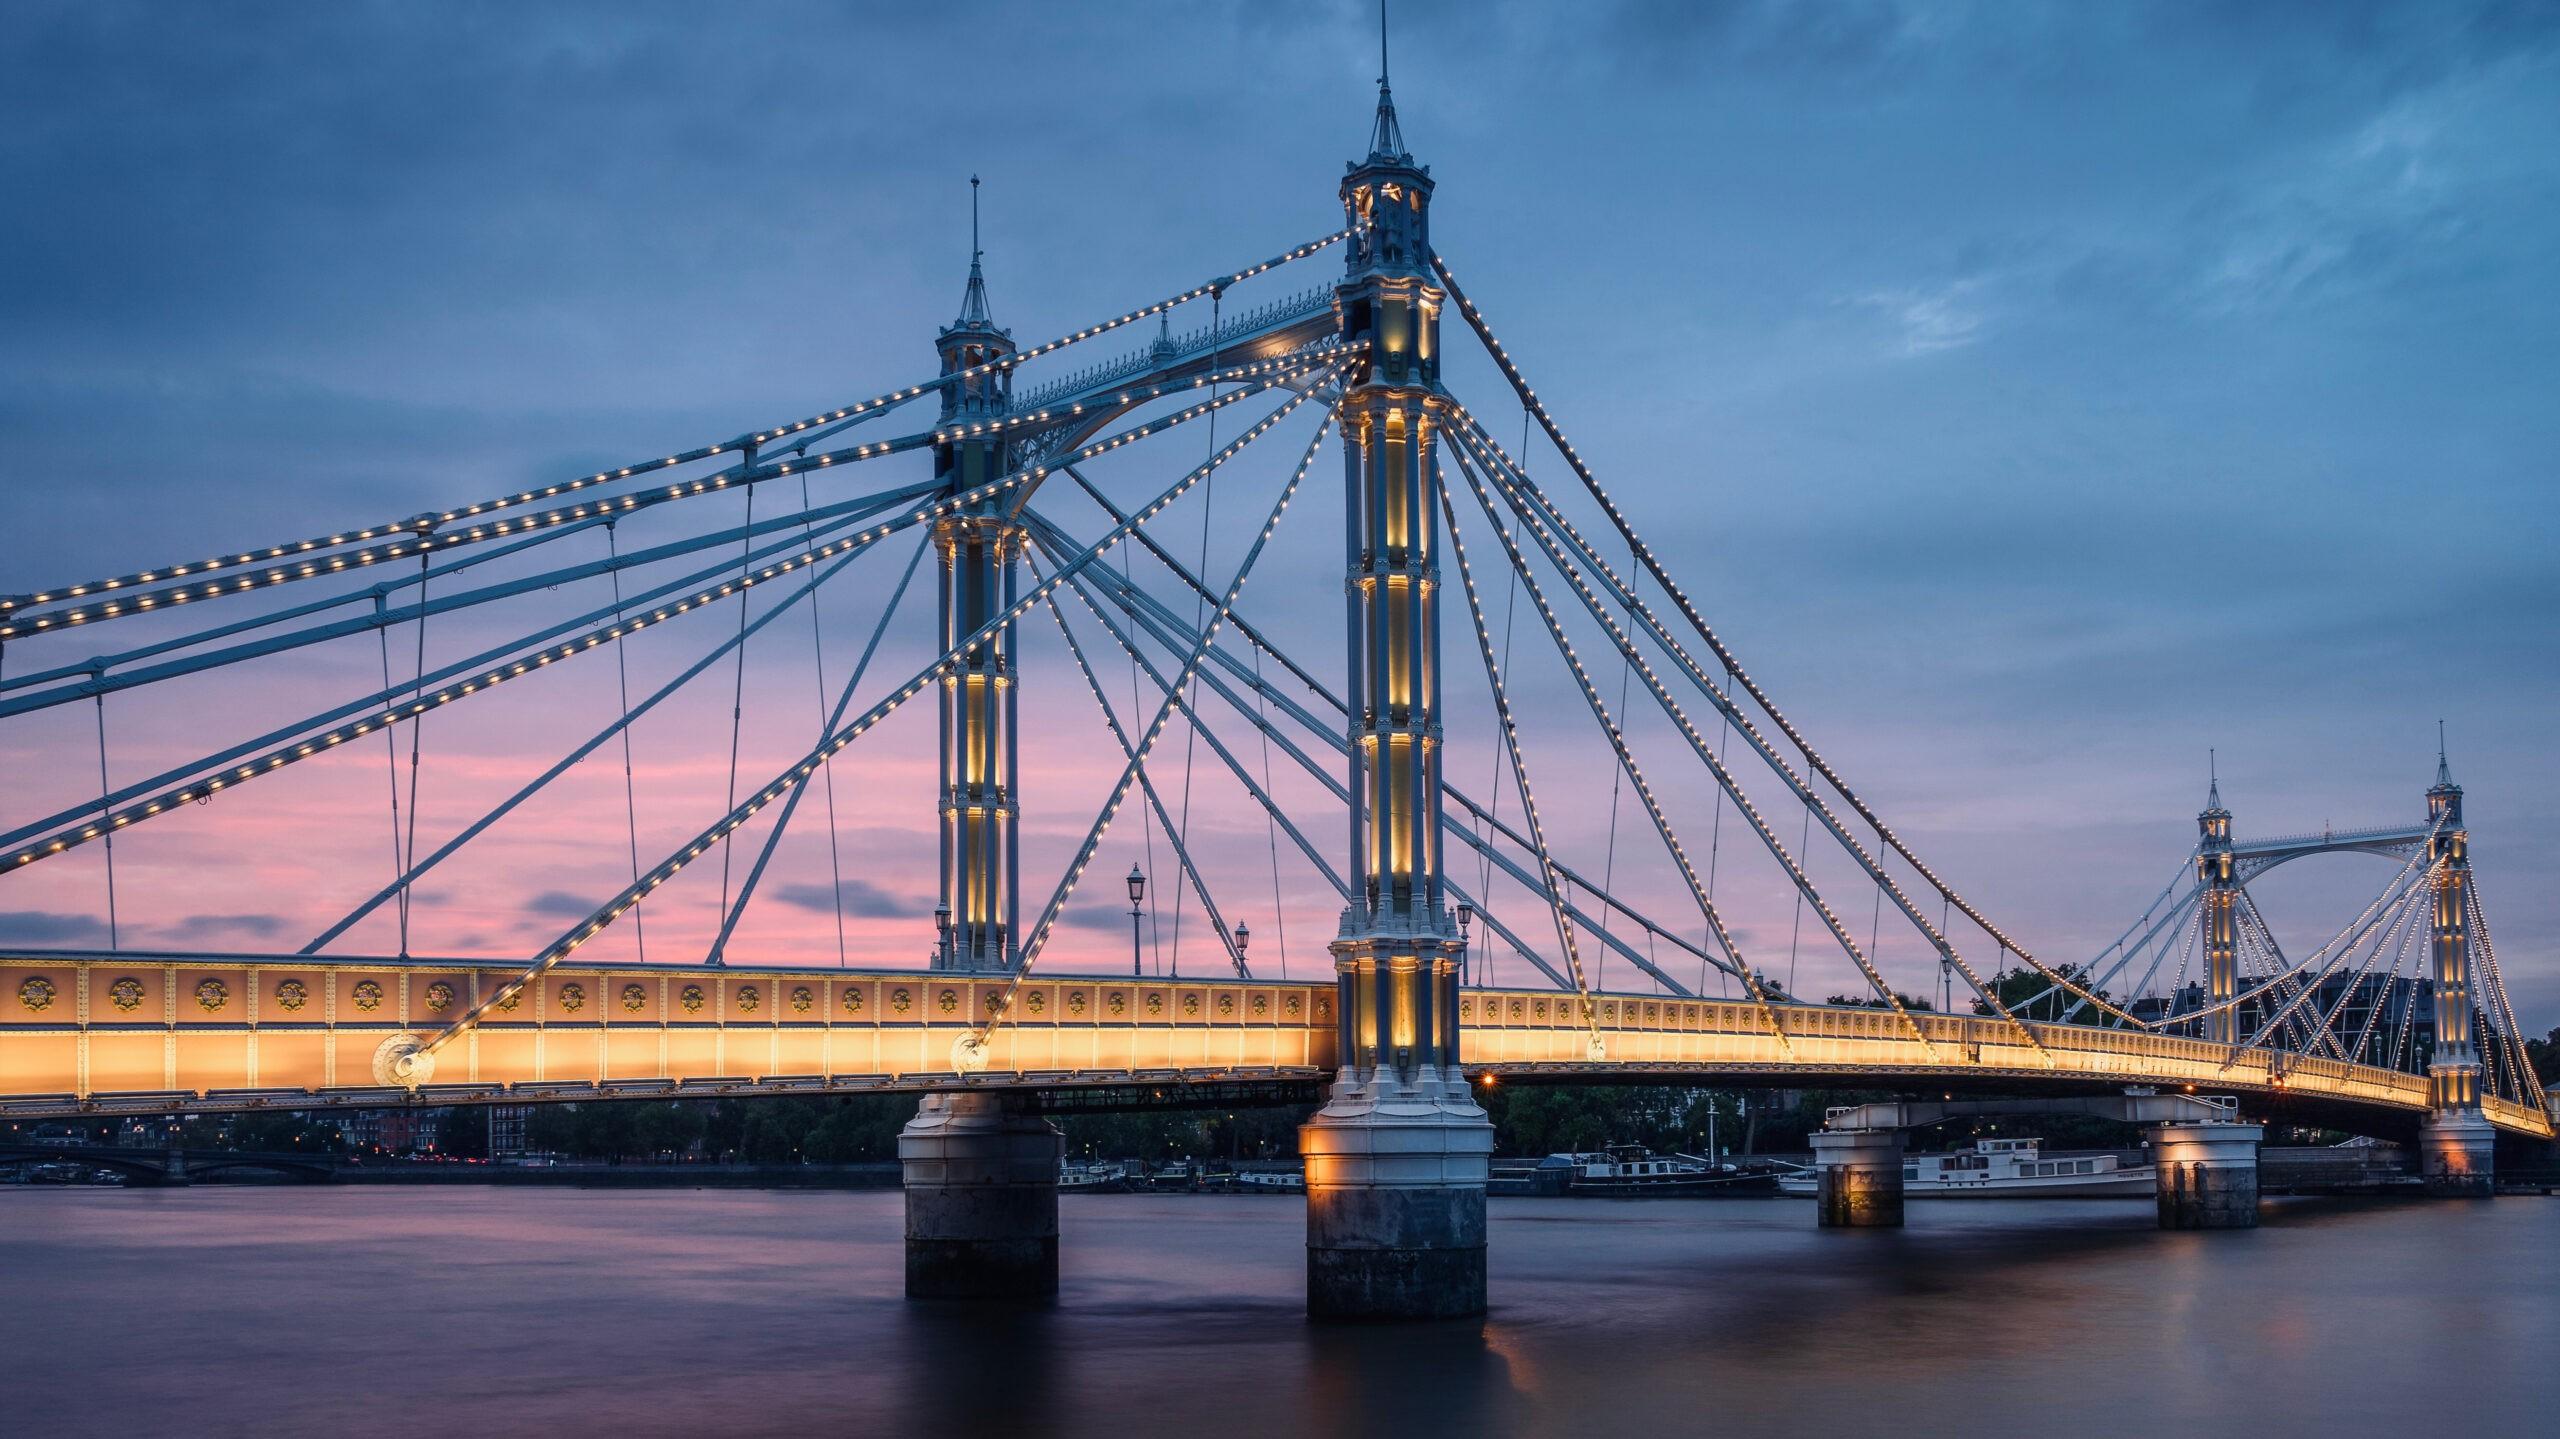 Albert Bridge, Λονδίνο